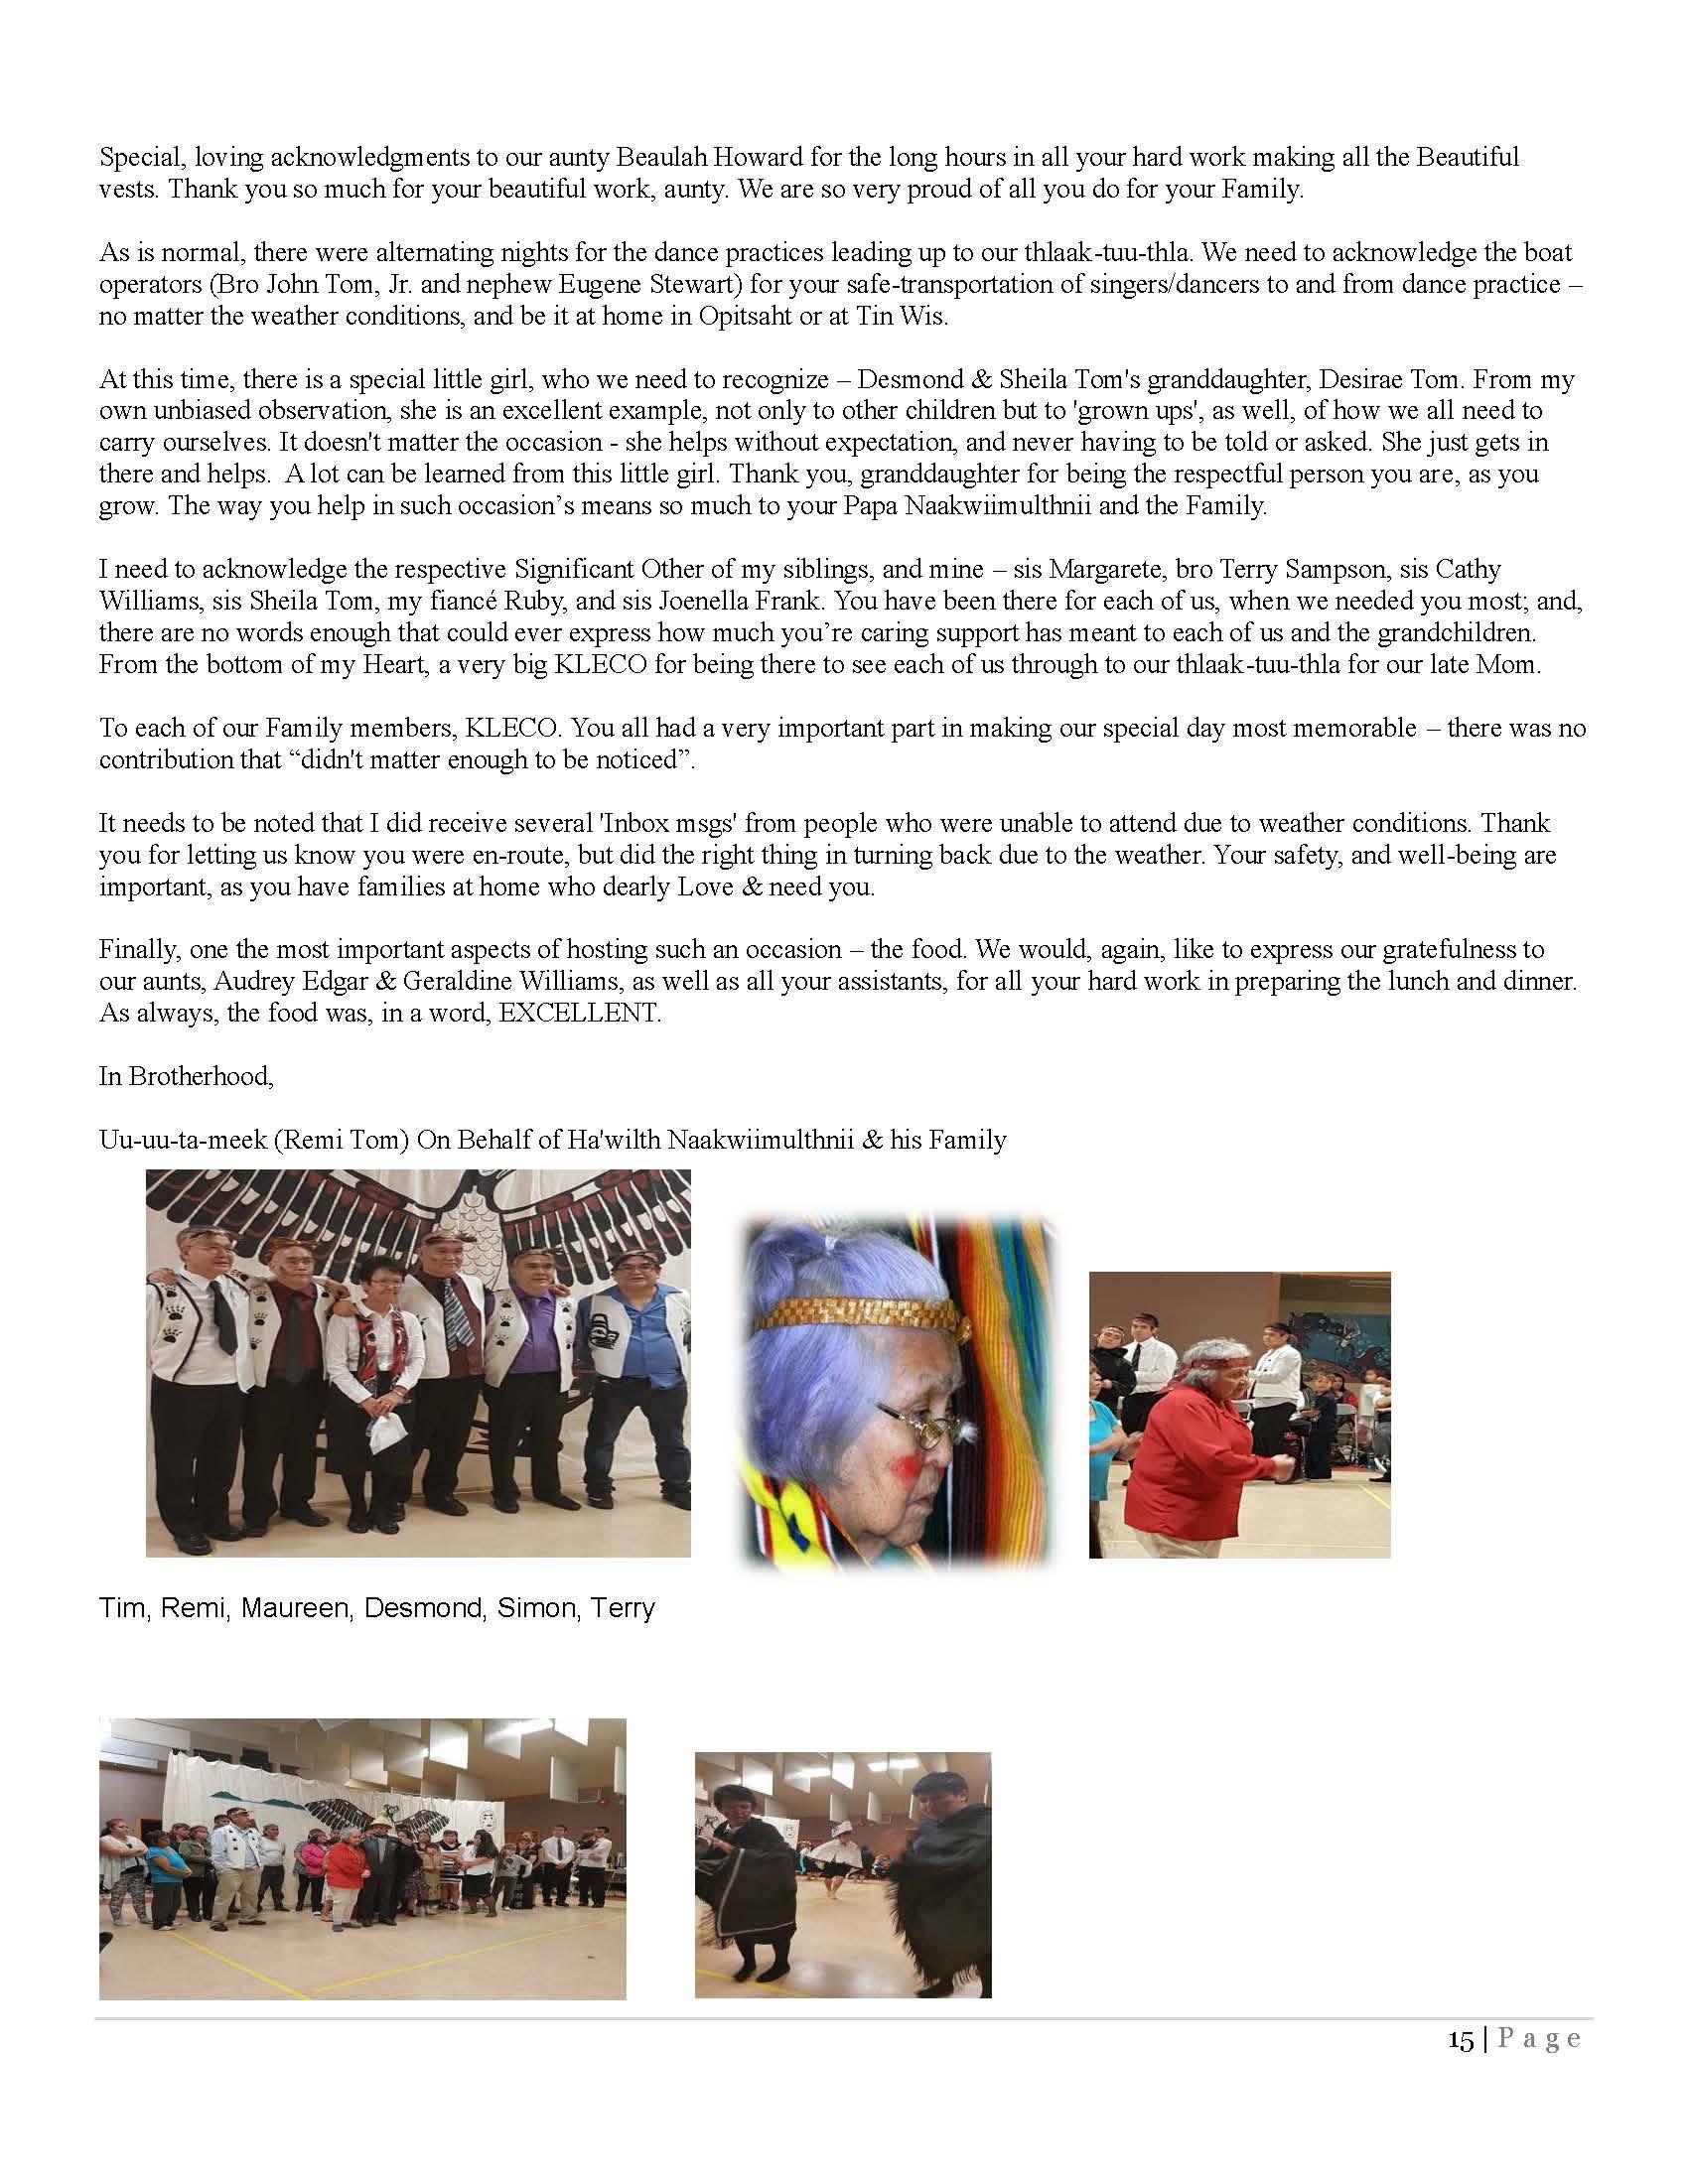 TFN Bulletin March 15-2017_Page_15.jpg